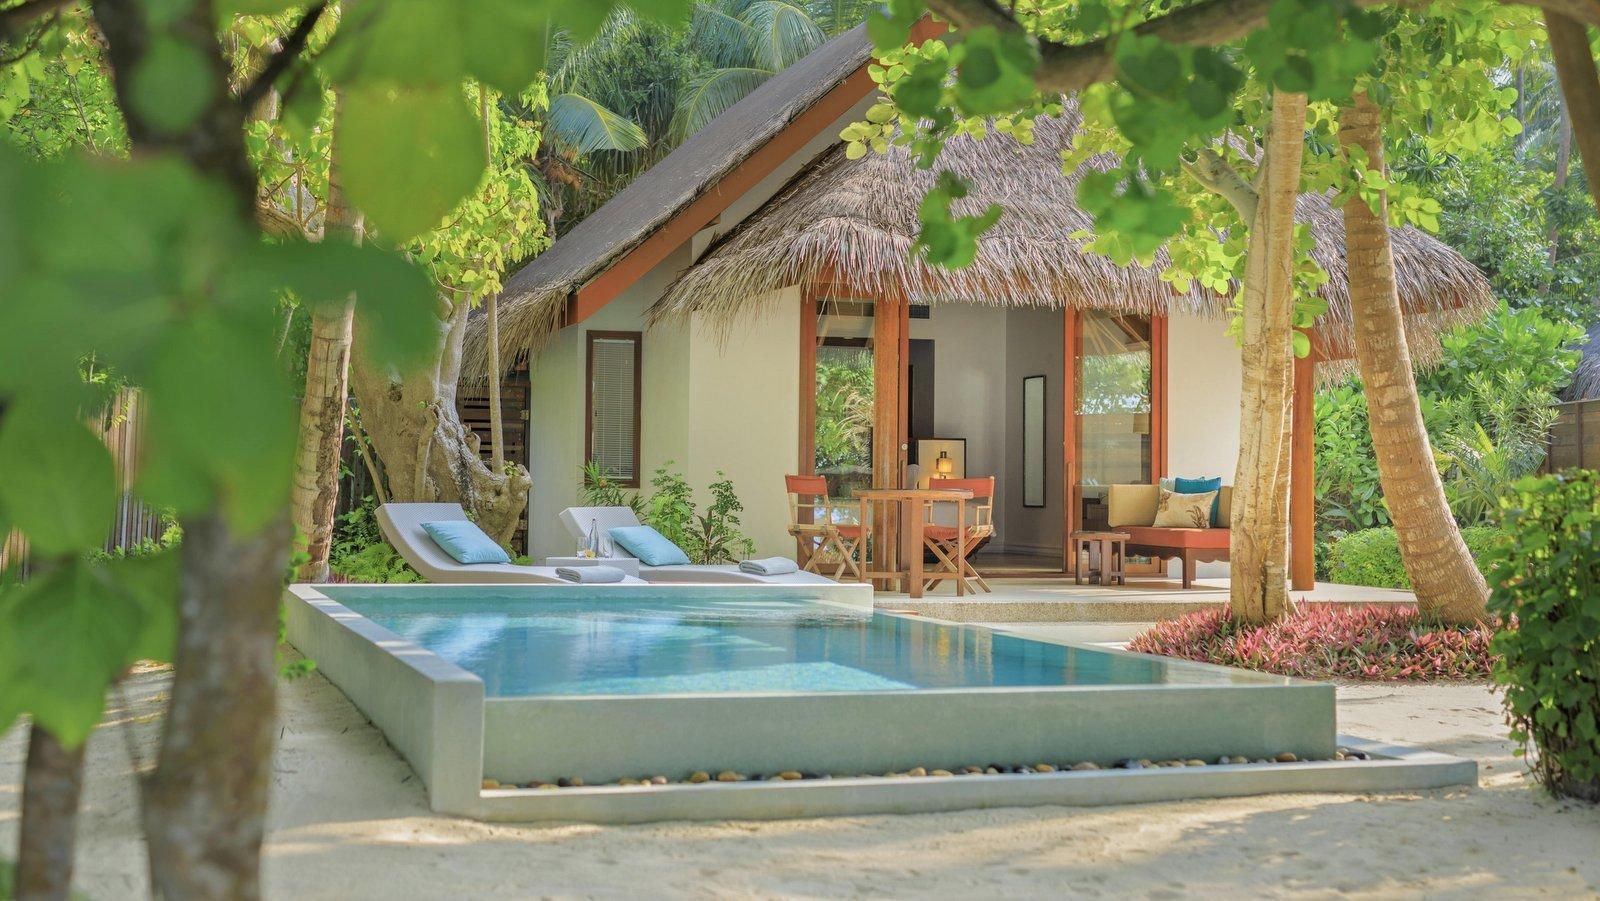 Мальдивы, отель Dusit Thani Maldives, номер Deluxe Beach Villa with Pool